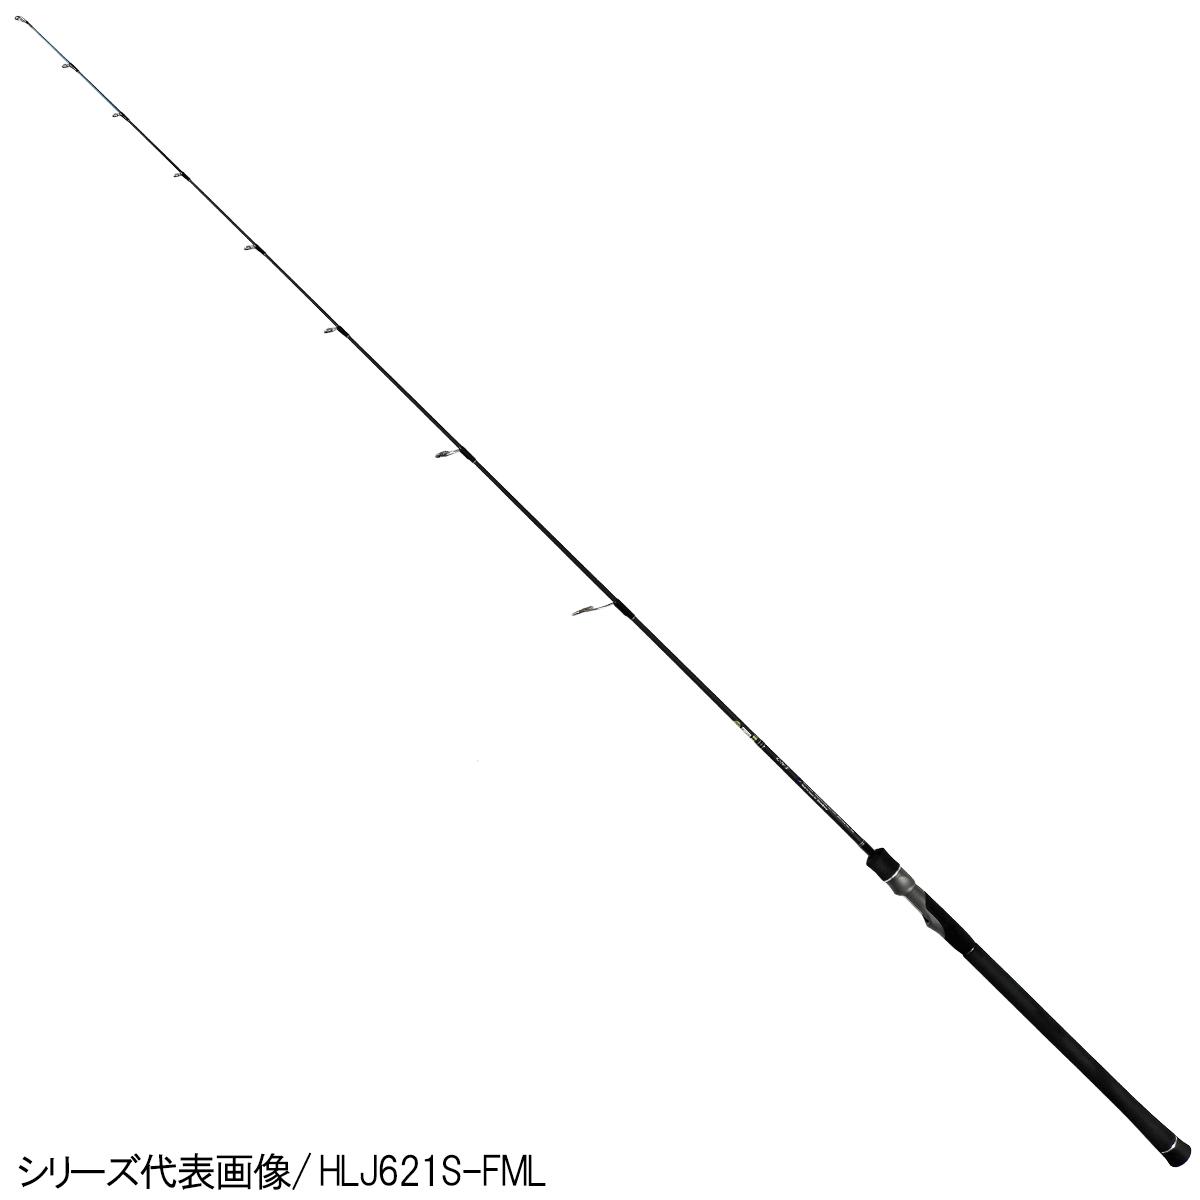 天龍 HORIZON LJ HLJ631S-FLL【大型商品】